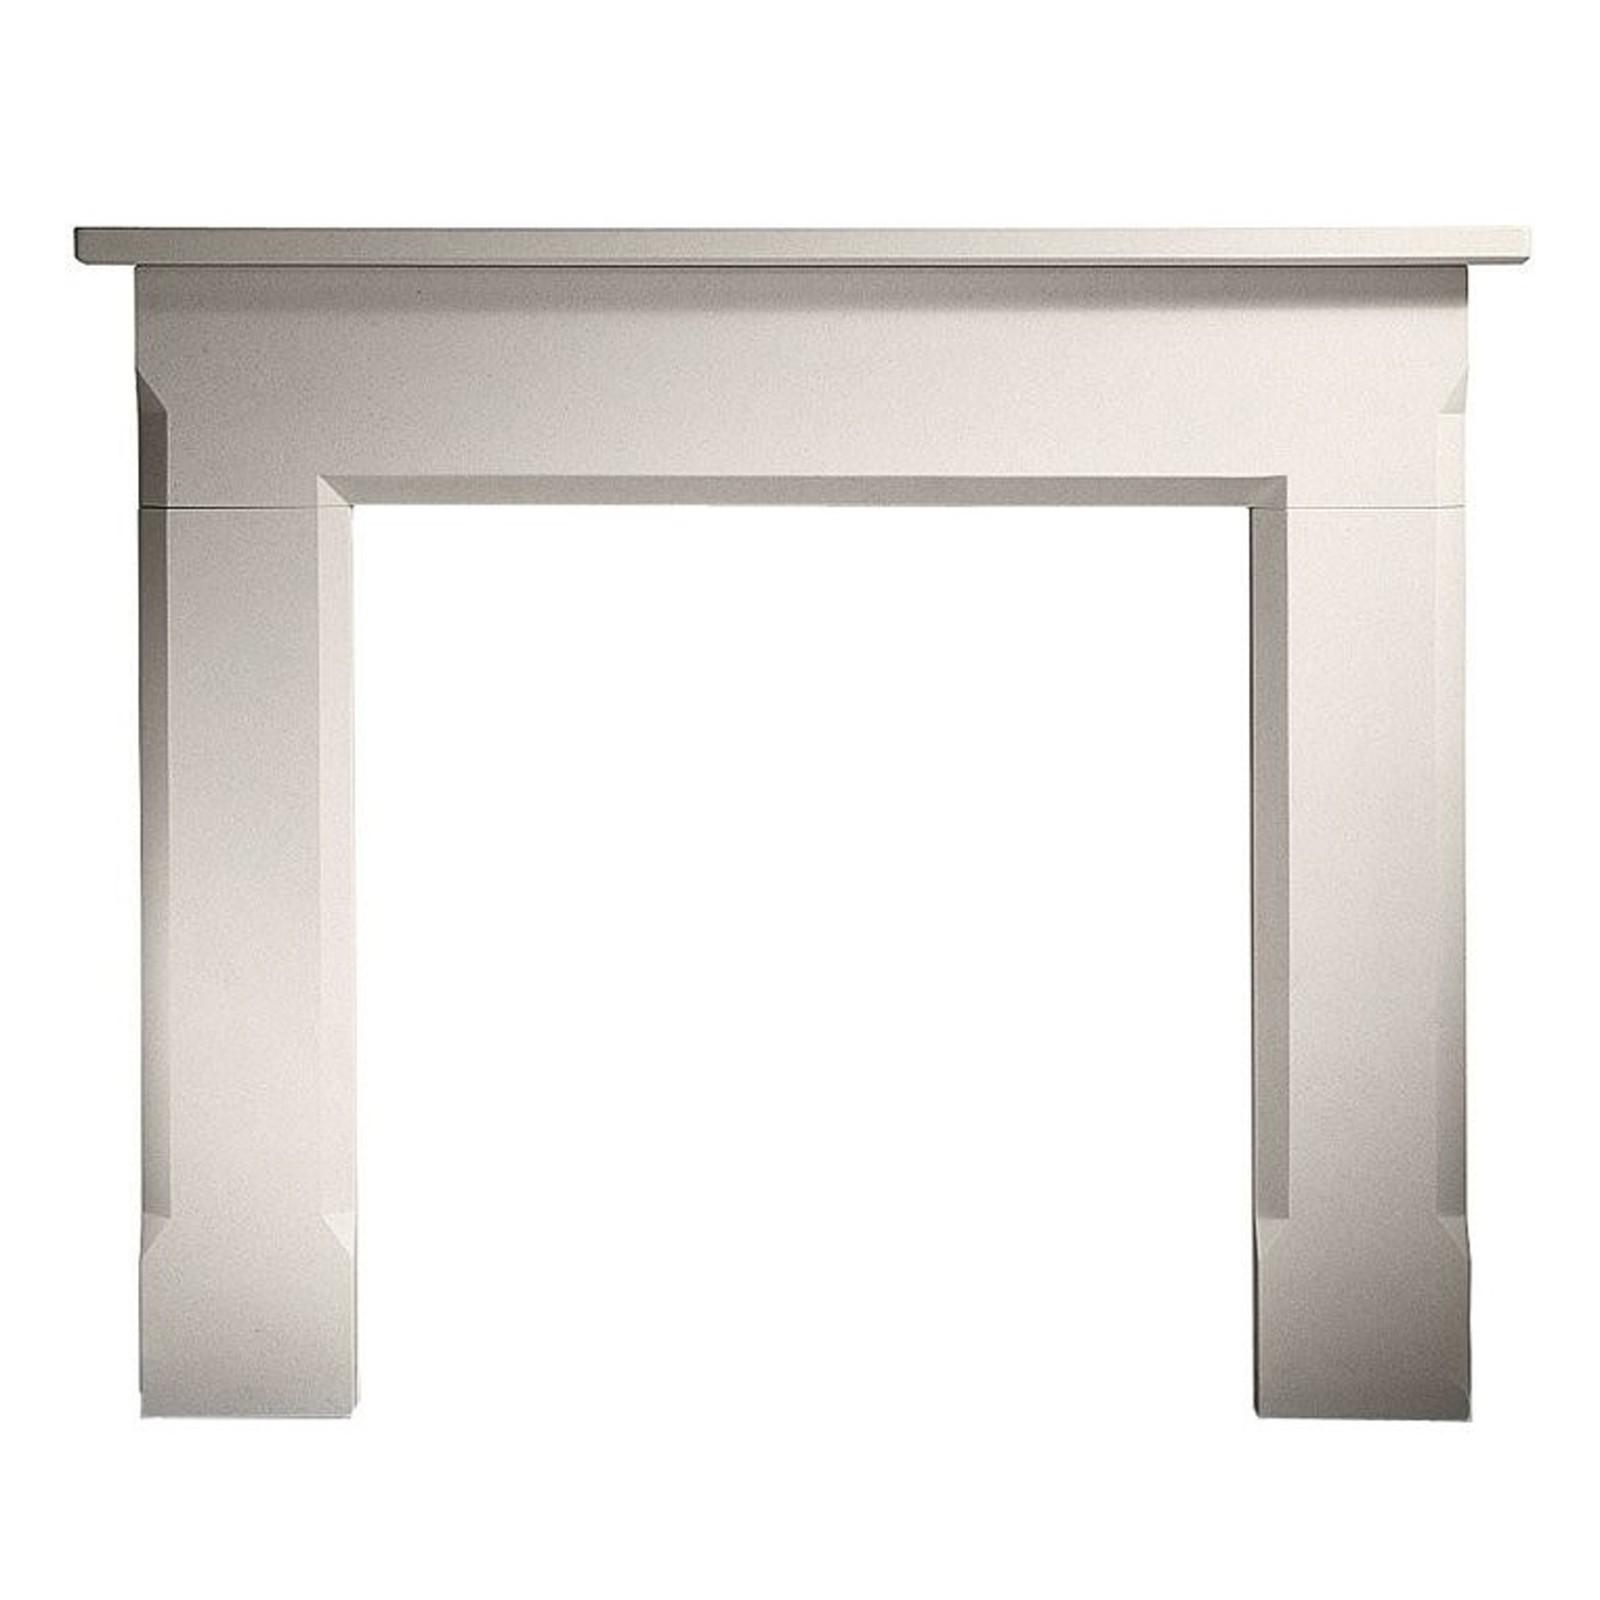 Luxury Gallery Sienna Limestone Fireplace Surround Mantel